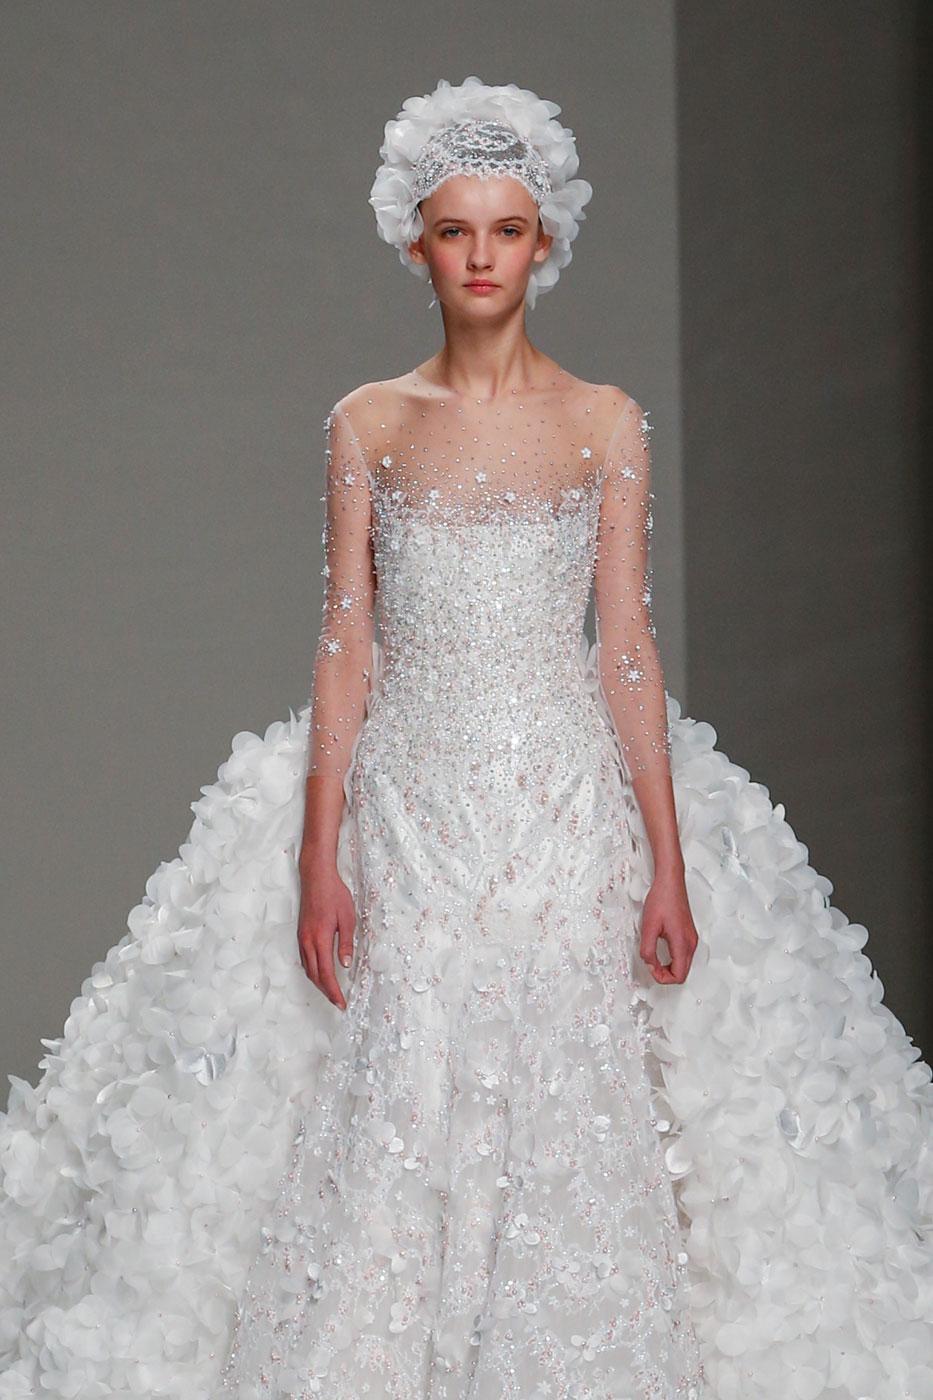 Georges-Hobeika-fashion-runway-show-haute-couture-paris-spring-2015-the-impression-86